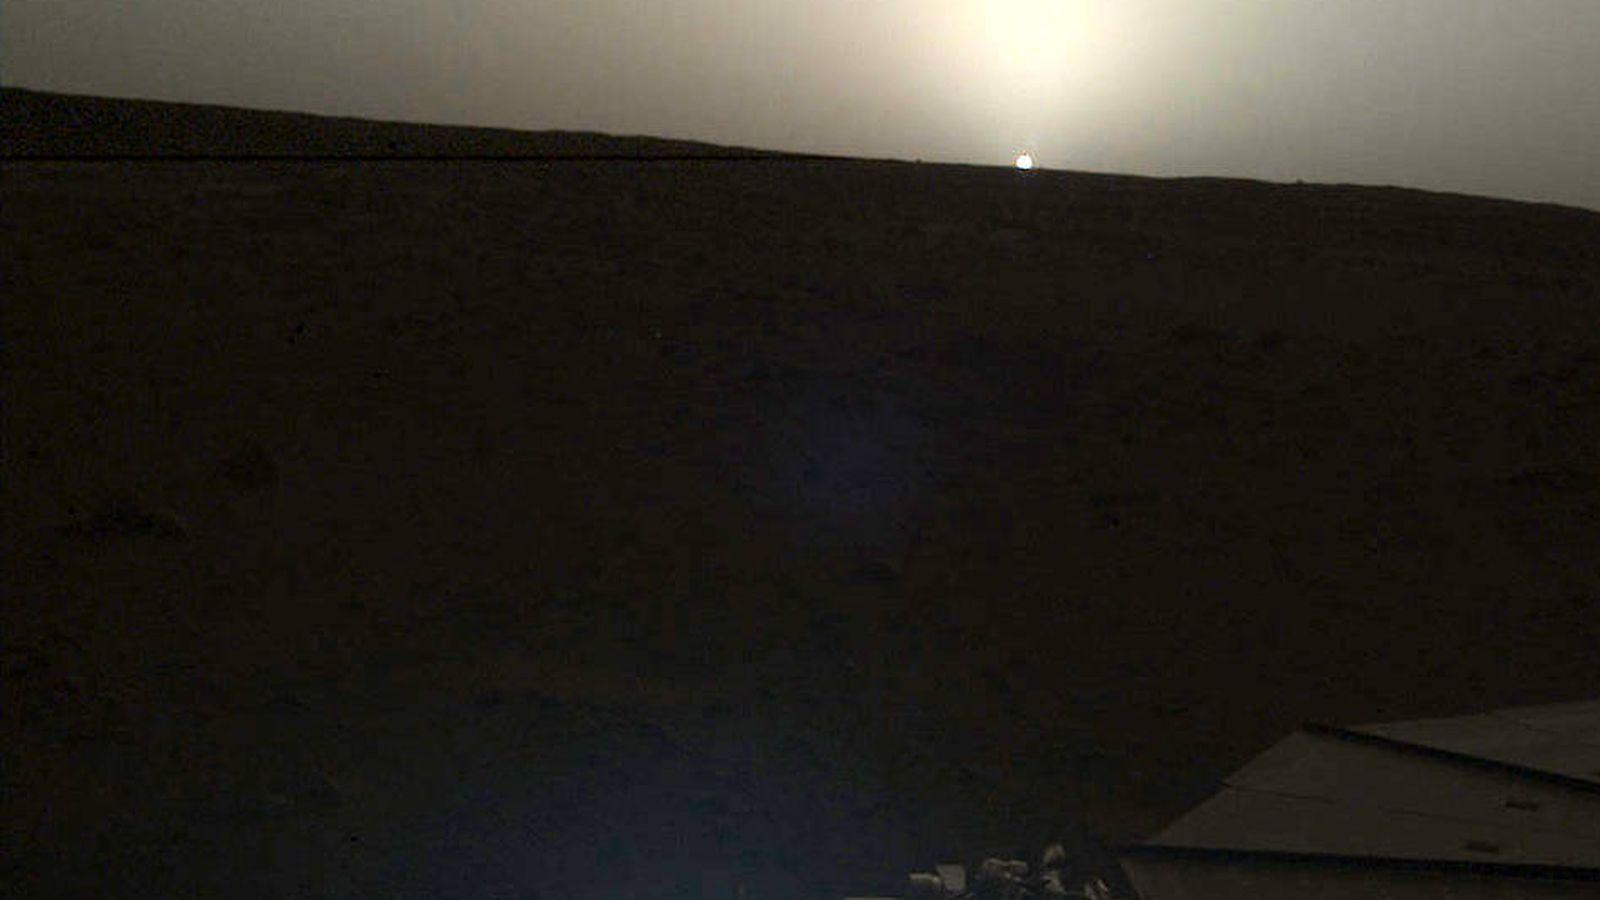 Foto: Imagen captada por la sonda InSight de la NASA